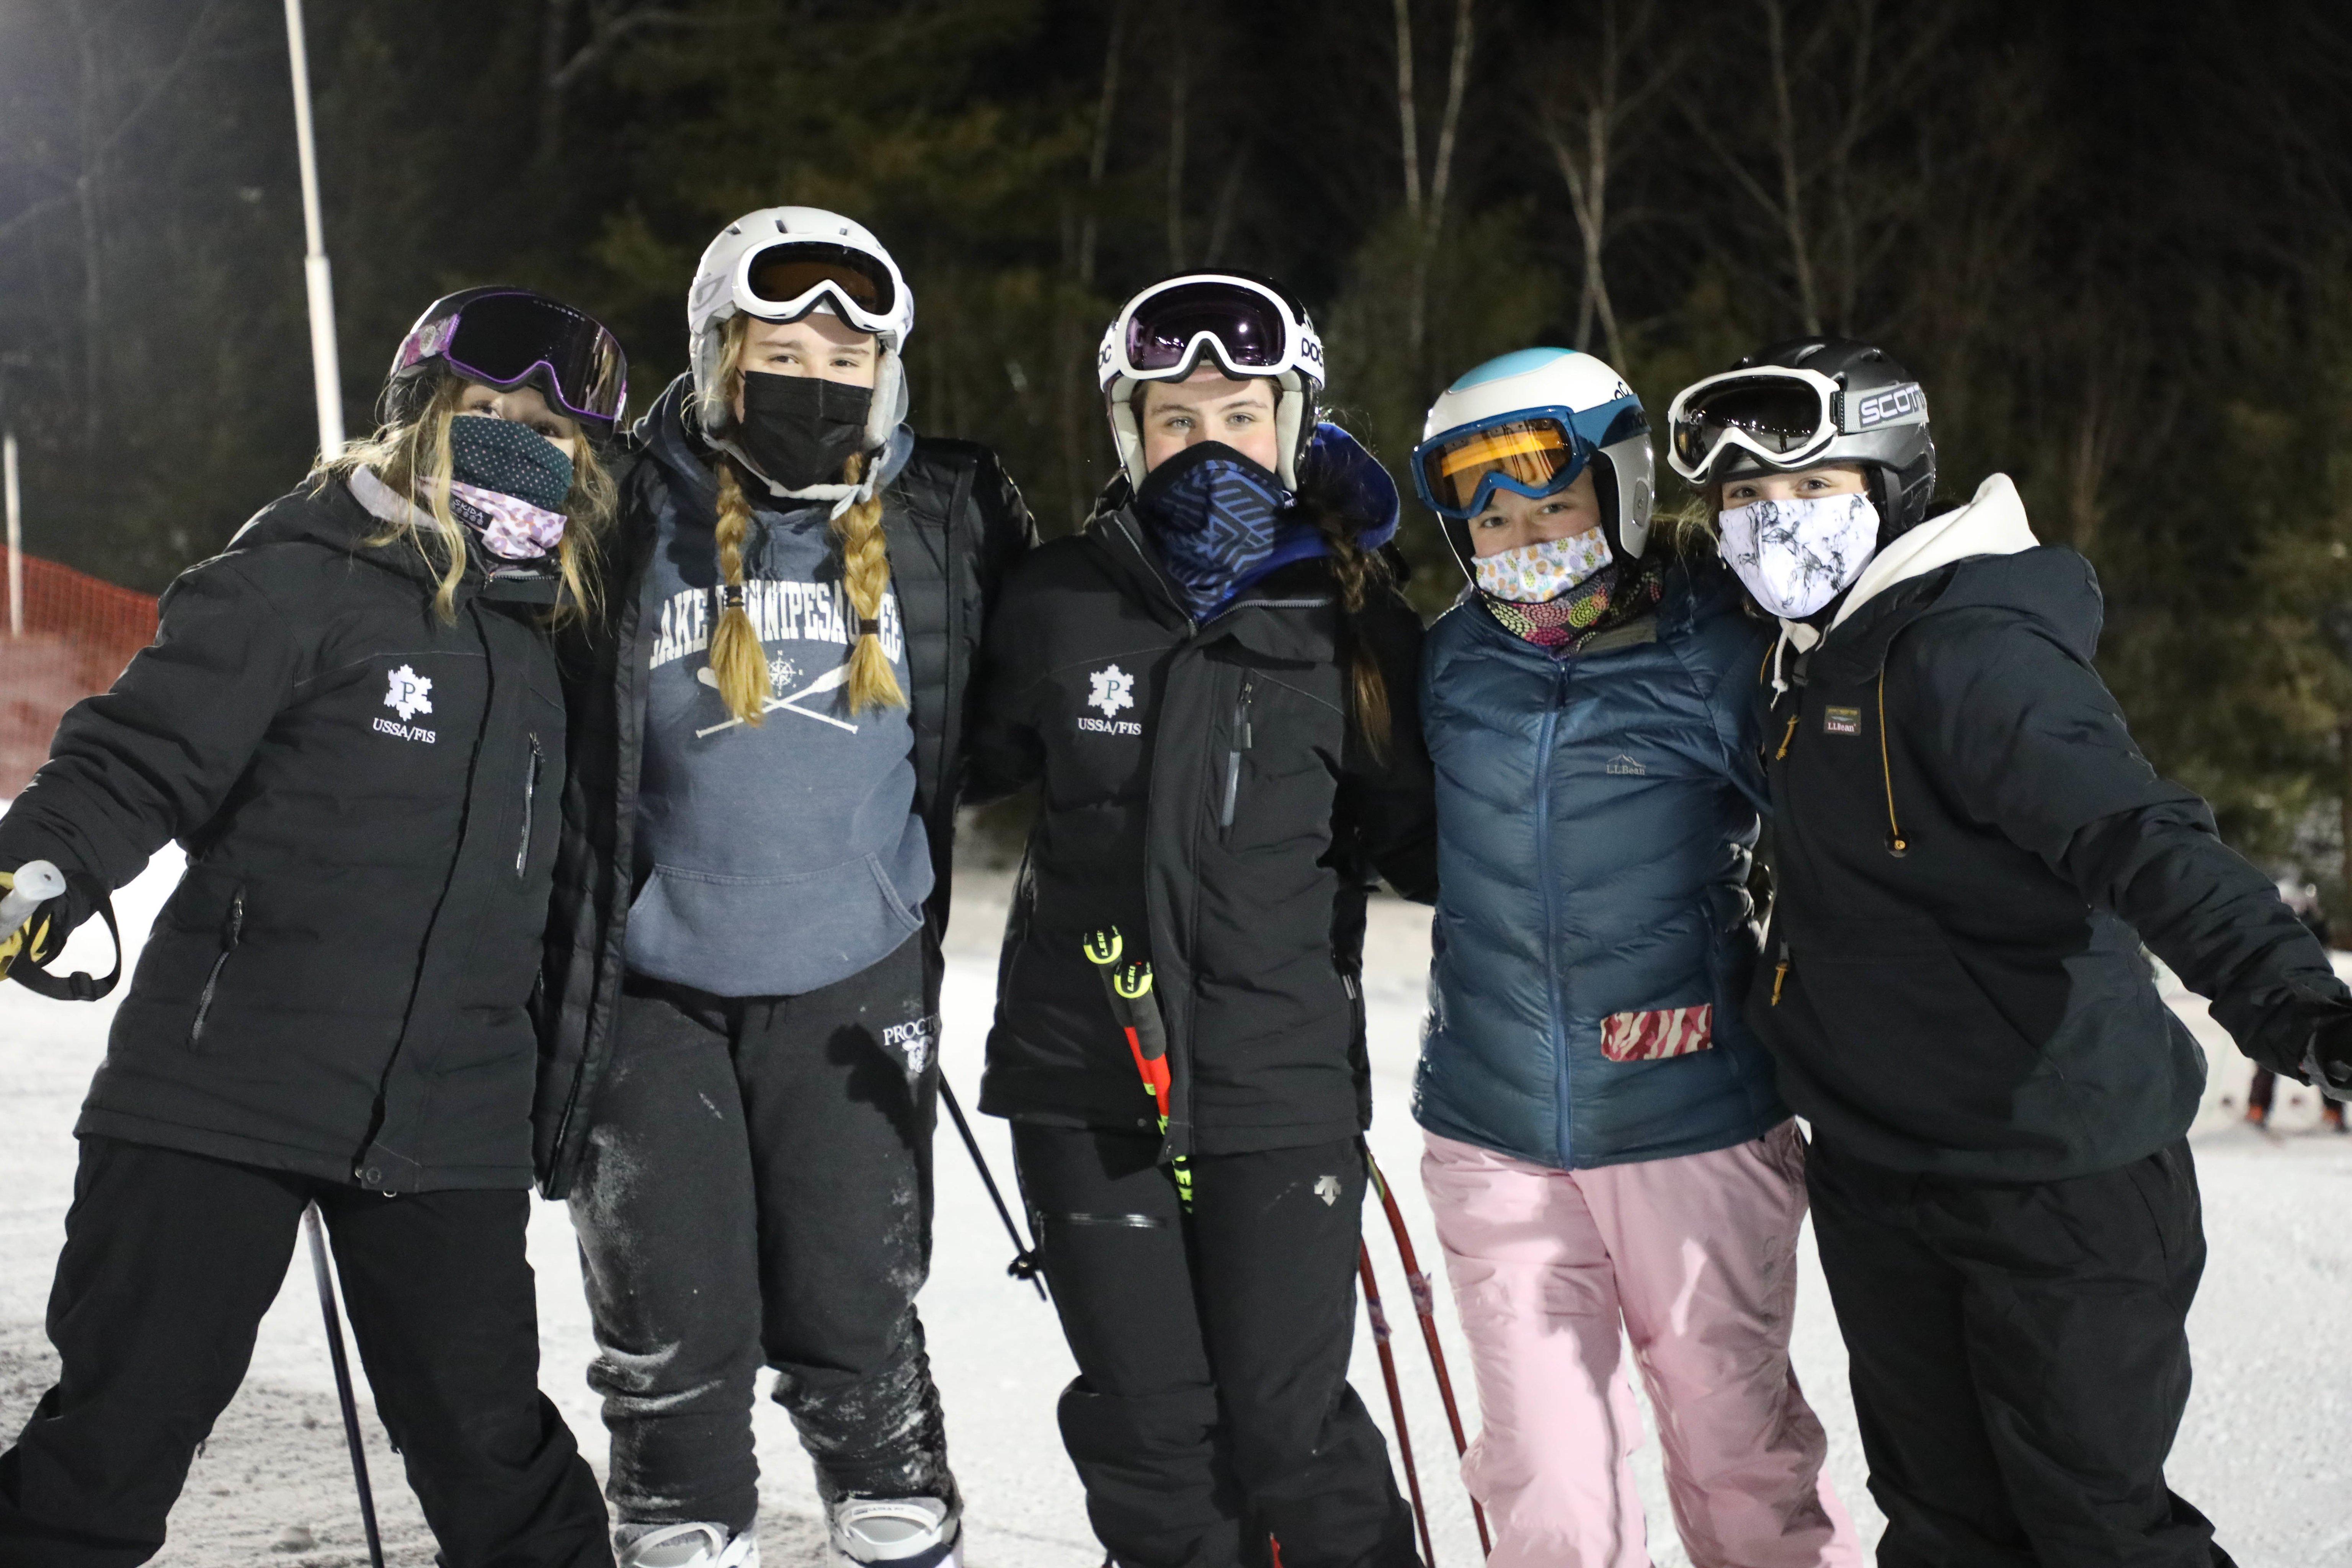 Proctor Academy Ski Area Boarding School Snow Sports Skiing